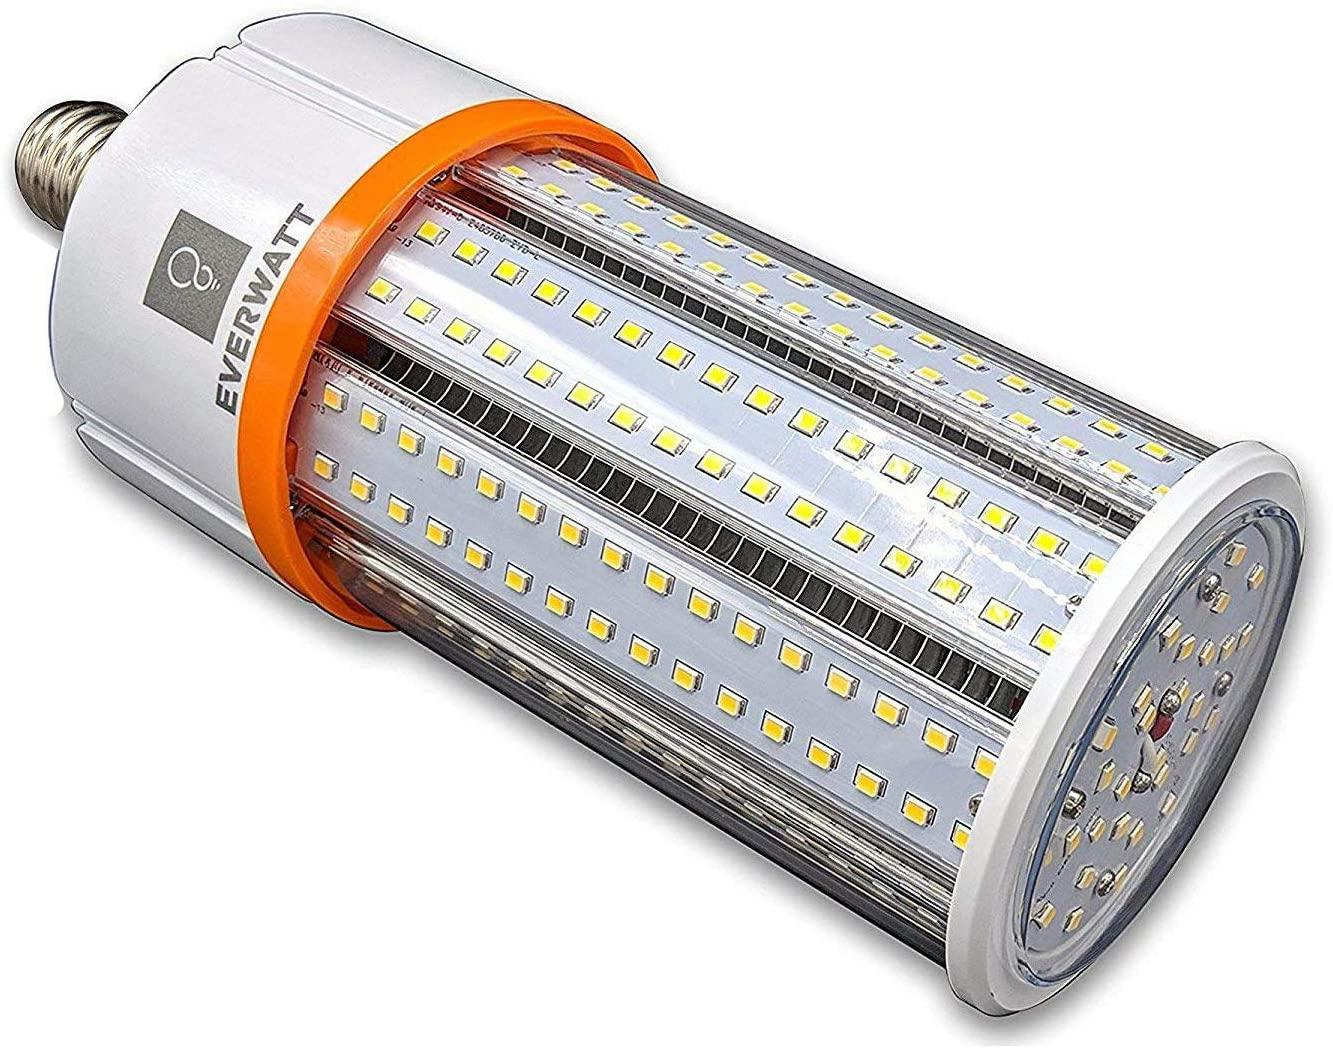 40W (200W Metal Halide Equiv) LED Corn Light Bulb, Standard E26 Base, 5479 LMS, 4000K, IP64 Waterproof, Indoor/Outdoor Area Light, Replaces MH, HID, CFL, HPS